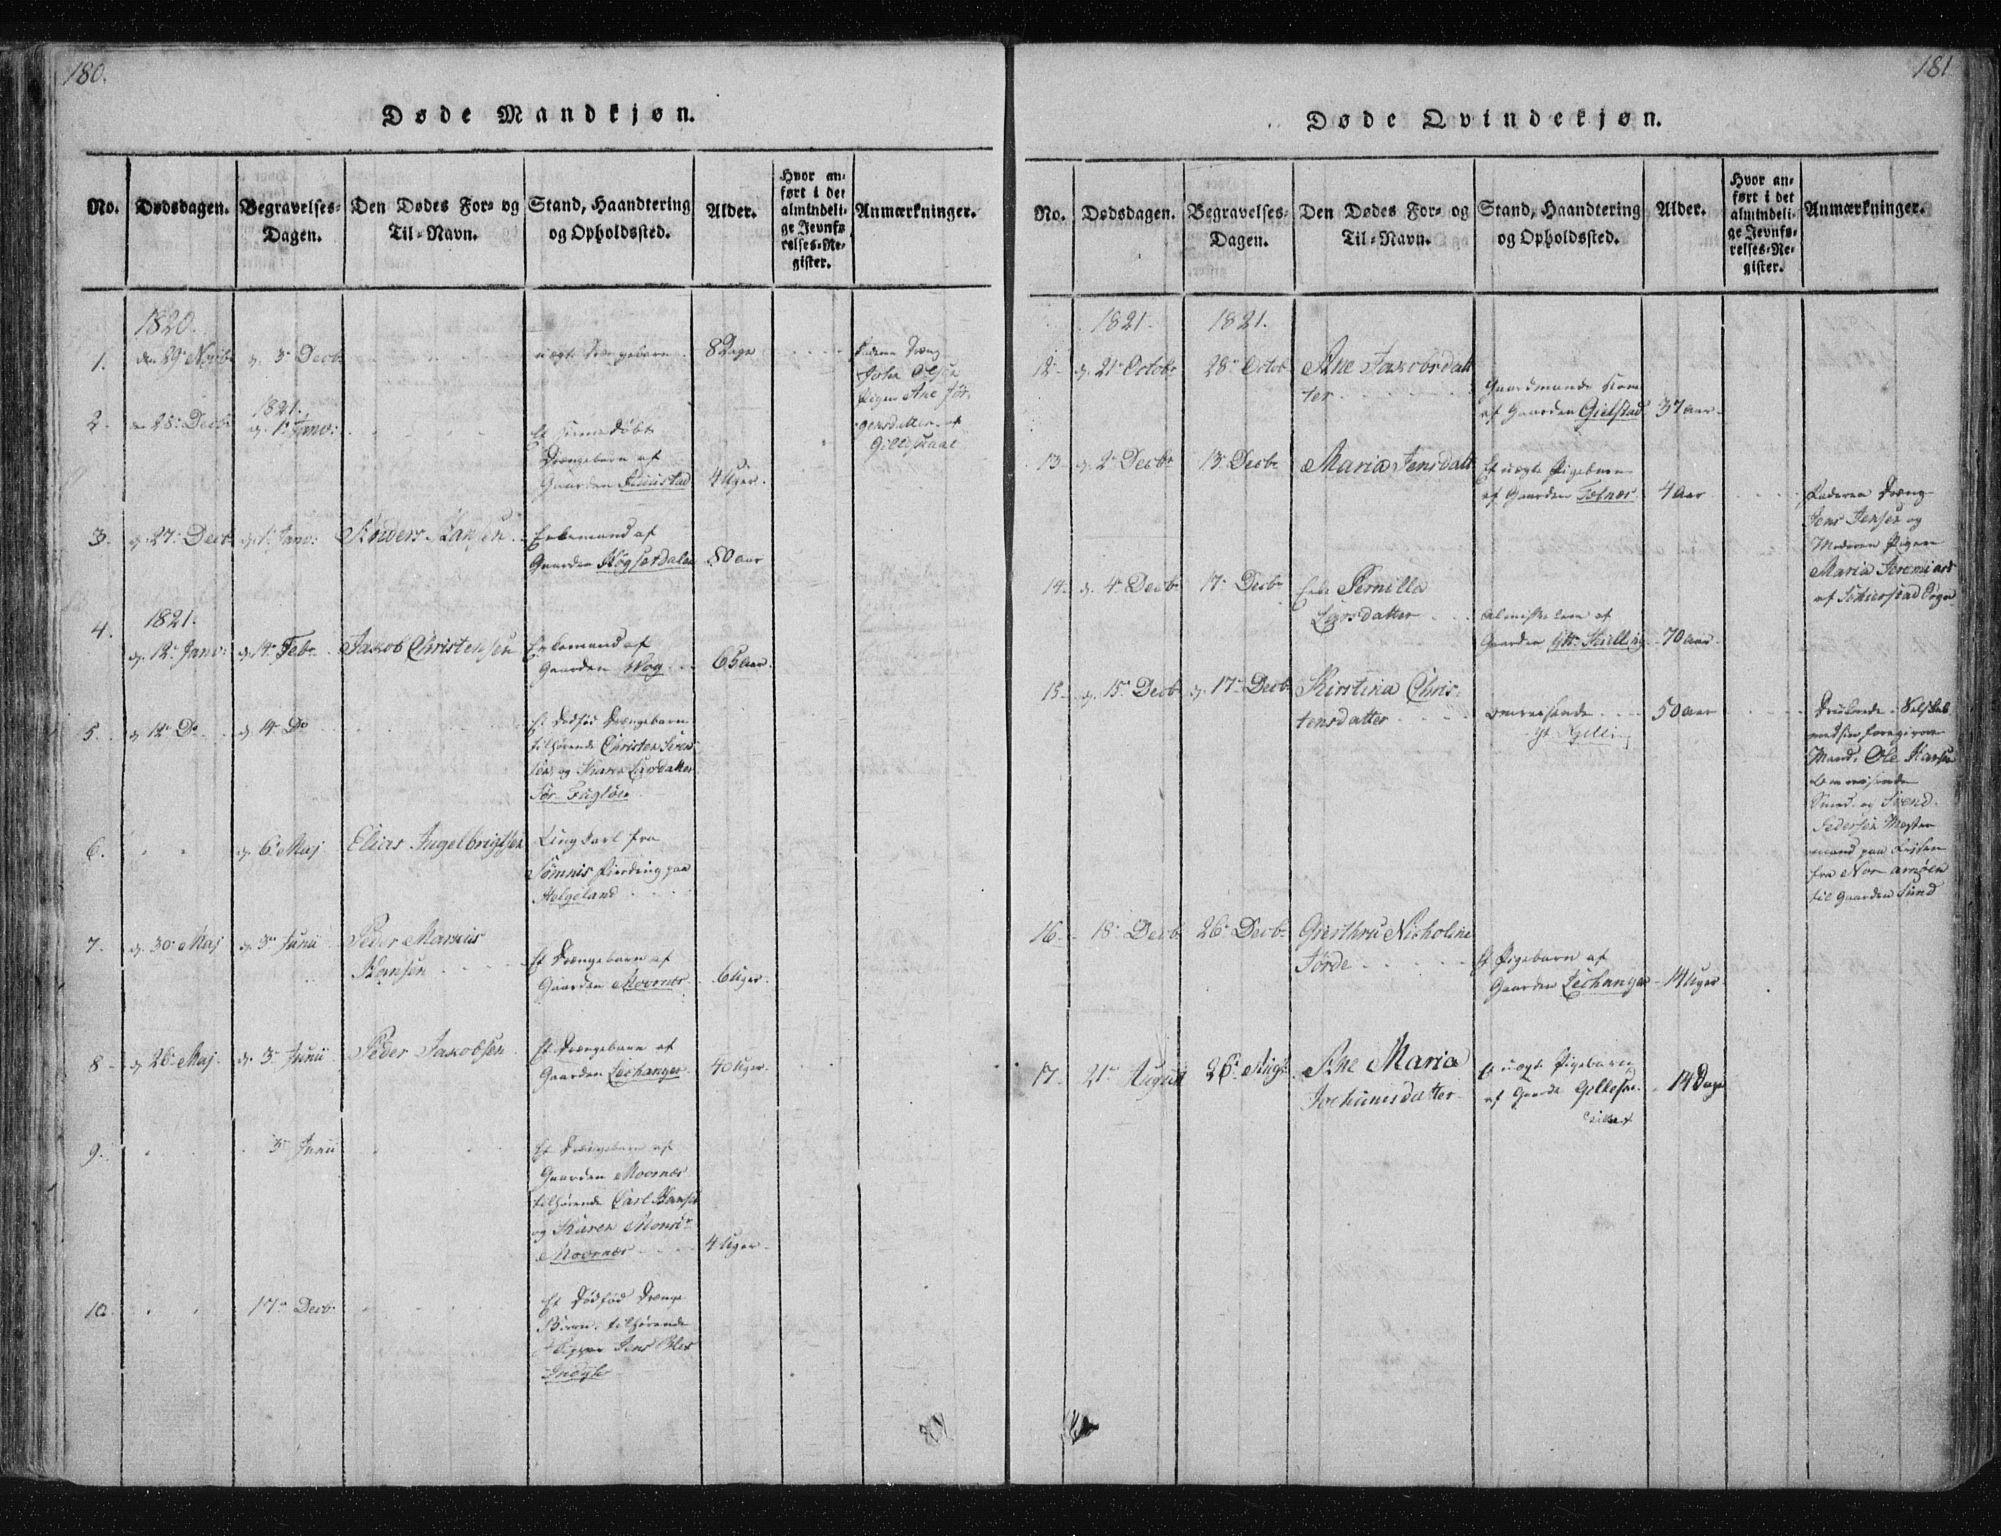 SAT, Ministerialprotokoller, klokkerbøker og fødselsregistre - Nordland, 805/L0096: Ministerialbok nr. 805A03, 1820-1837, s. 180-181